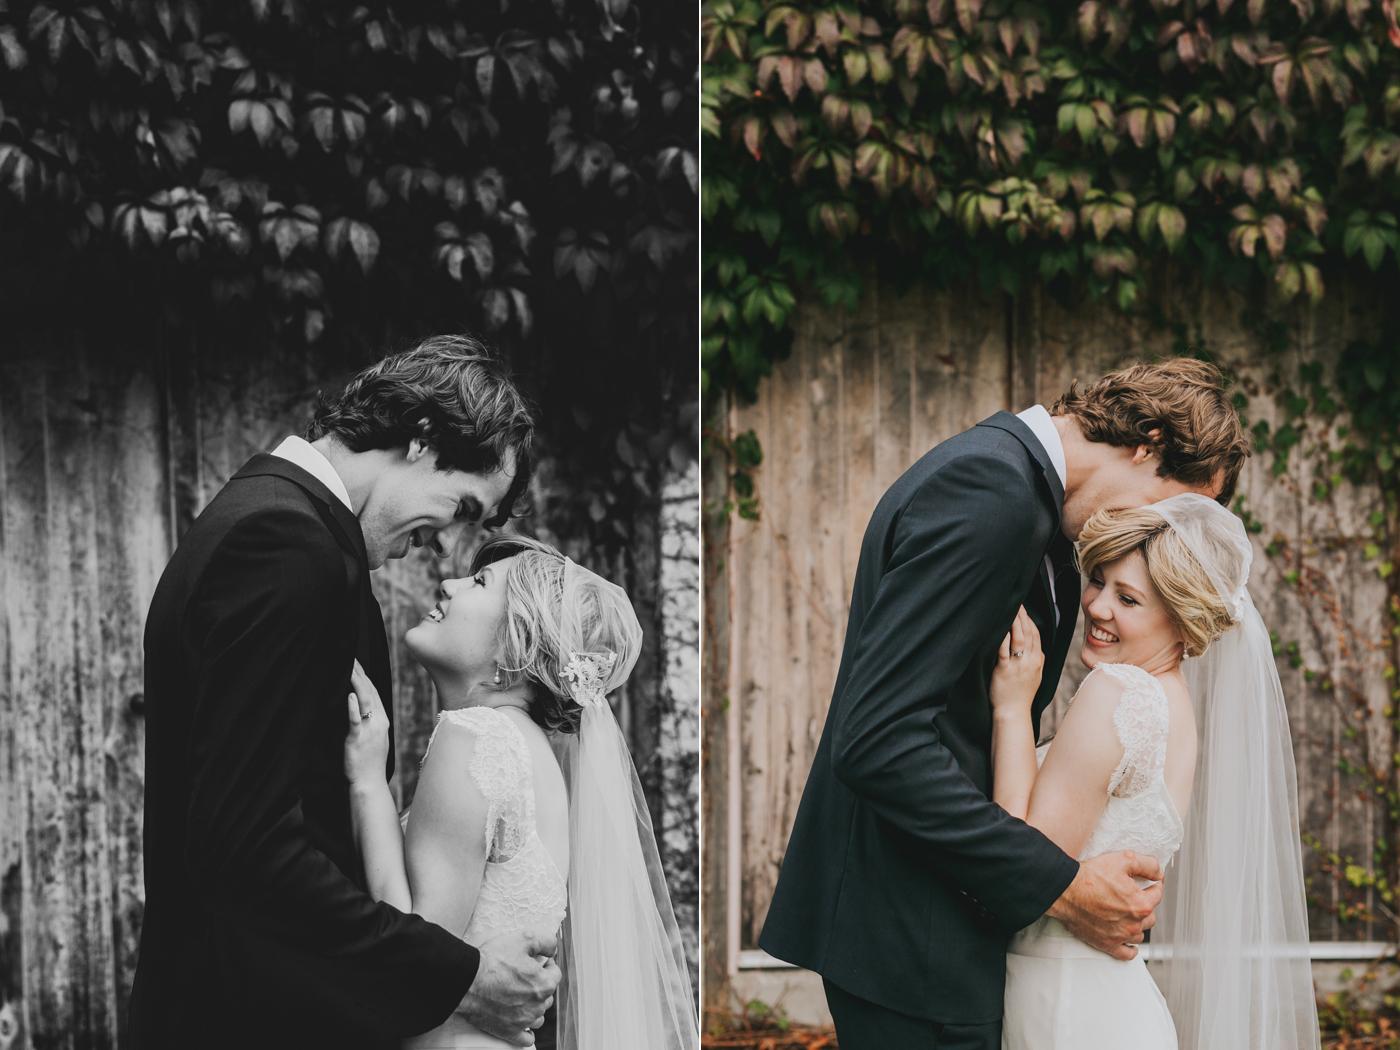 Rachel & Jacob - Willow Farm Berry - South Coast Wedding - Samantha Heather Photography-122.jpg